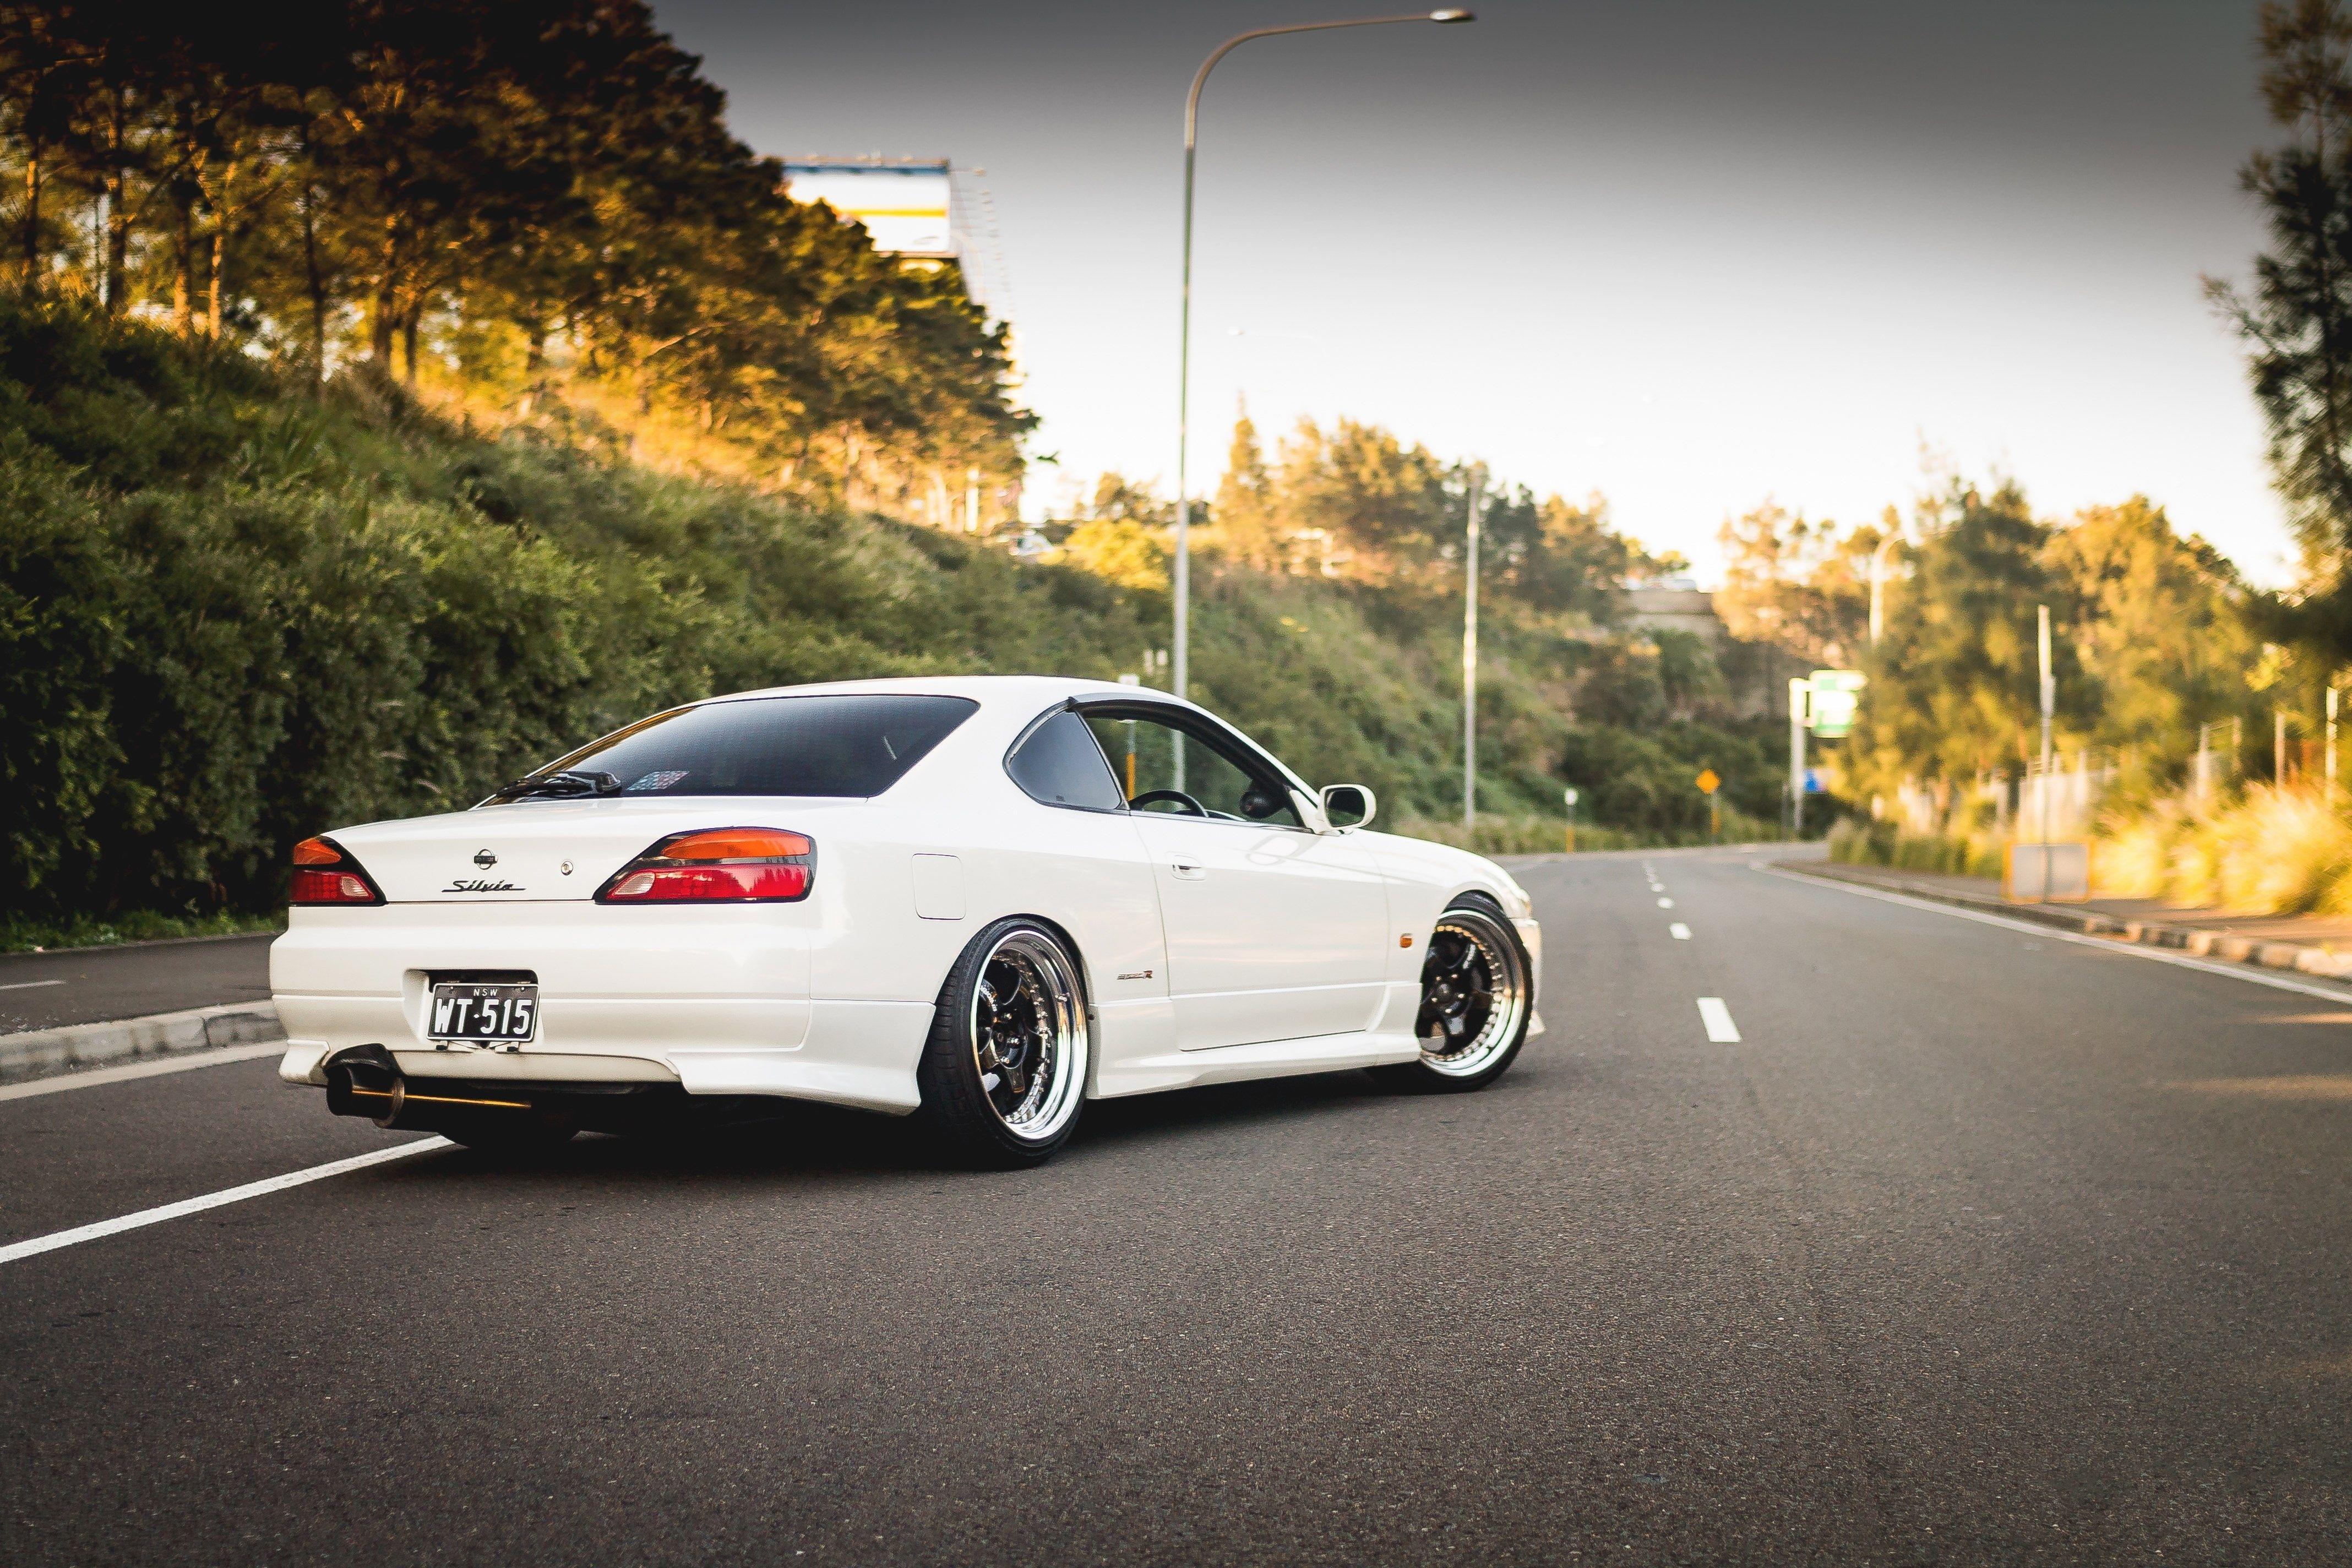 Nissan Silvia S15 Wallpaper Full Hd 2656 Kb Banks Gill